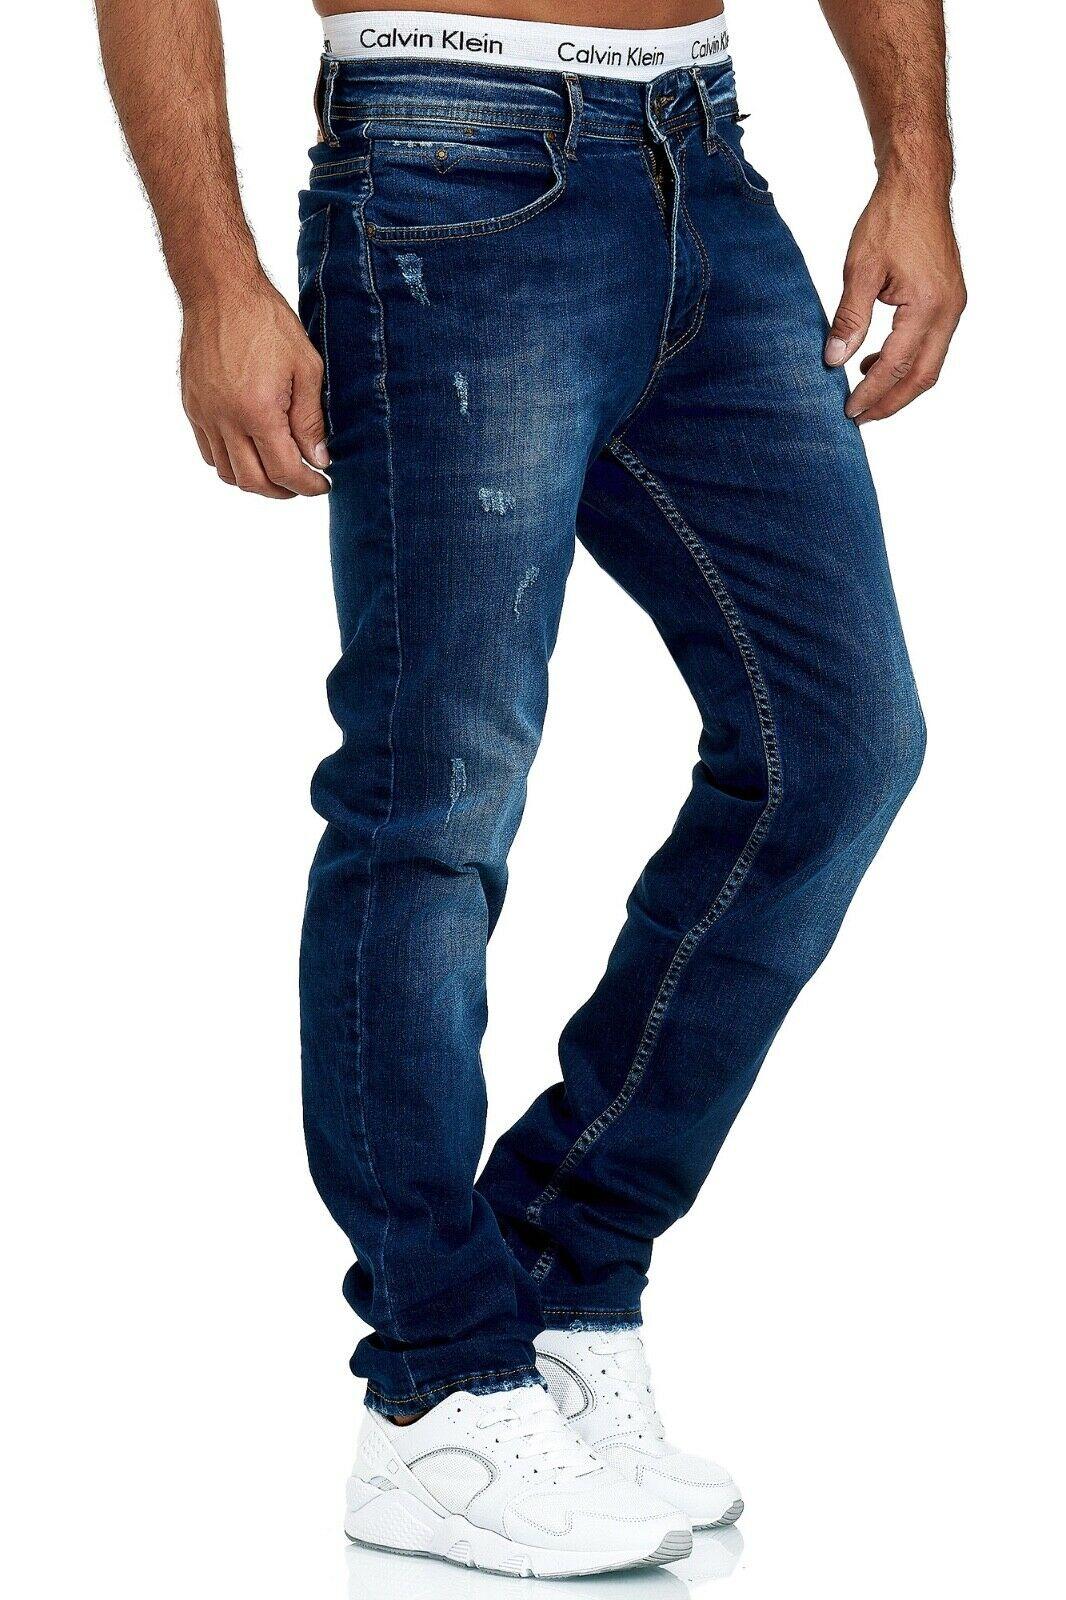 Herren-Jeans-Hose-Denim-KC-Black-Washed-Straight-Cut-Regular-Dicke-Naht-naehte Indexbild 58